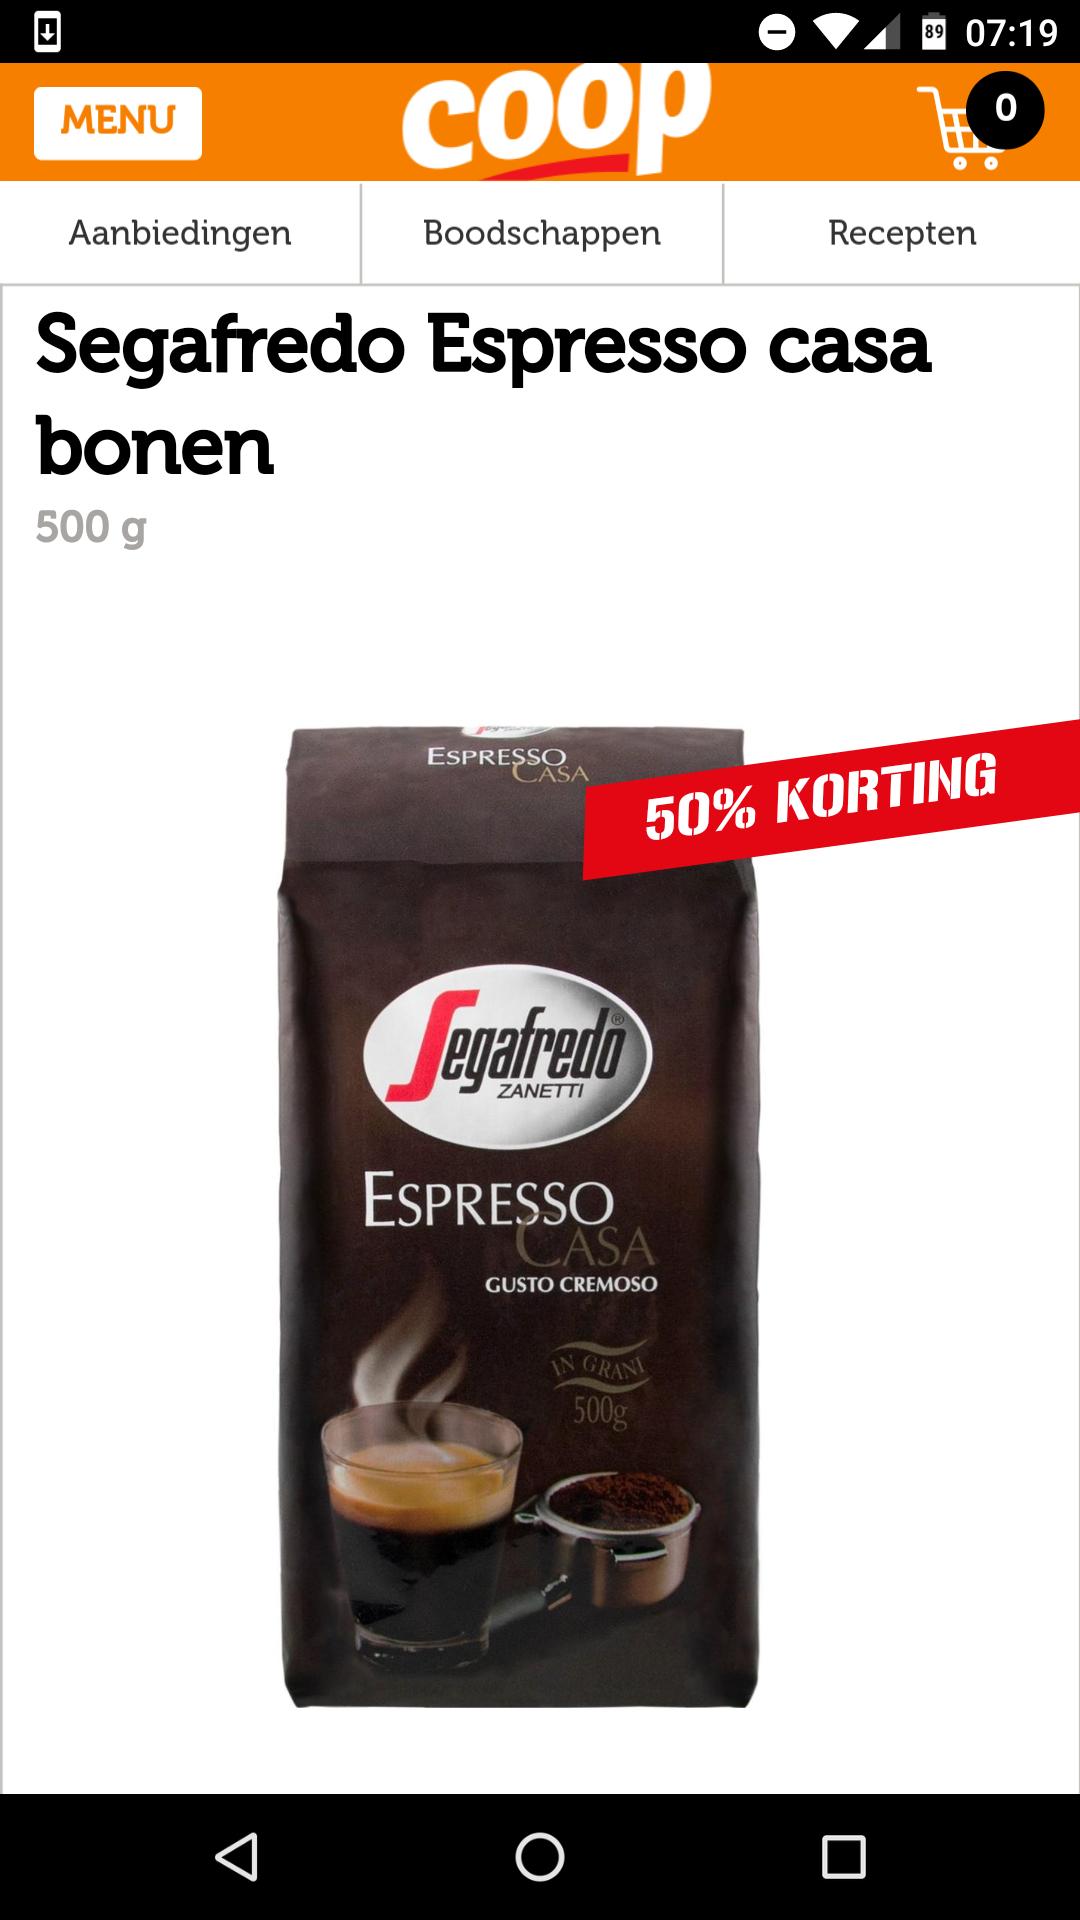 Segafredo Espresso casa bonen - 50% korting @ Coop